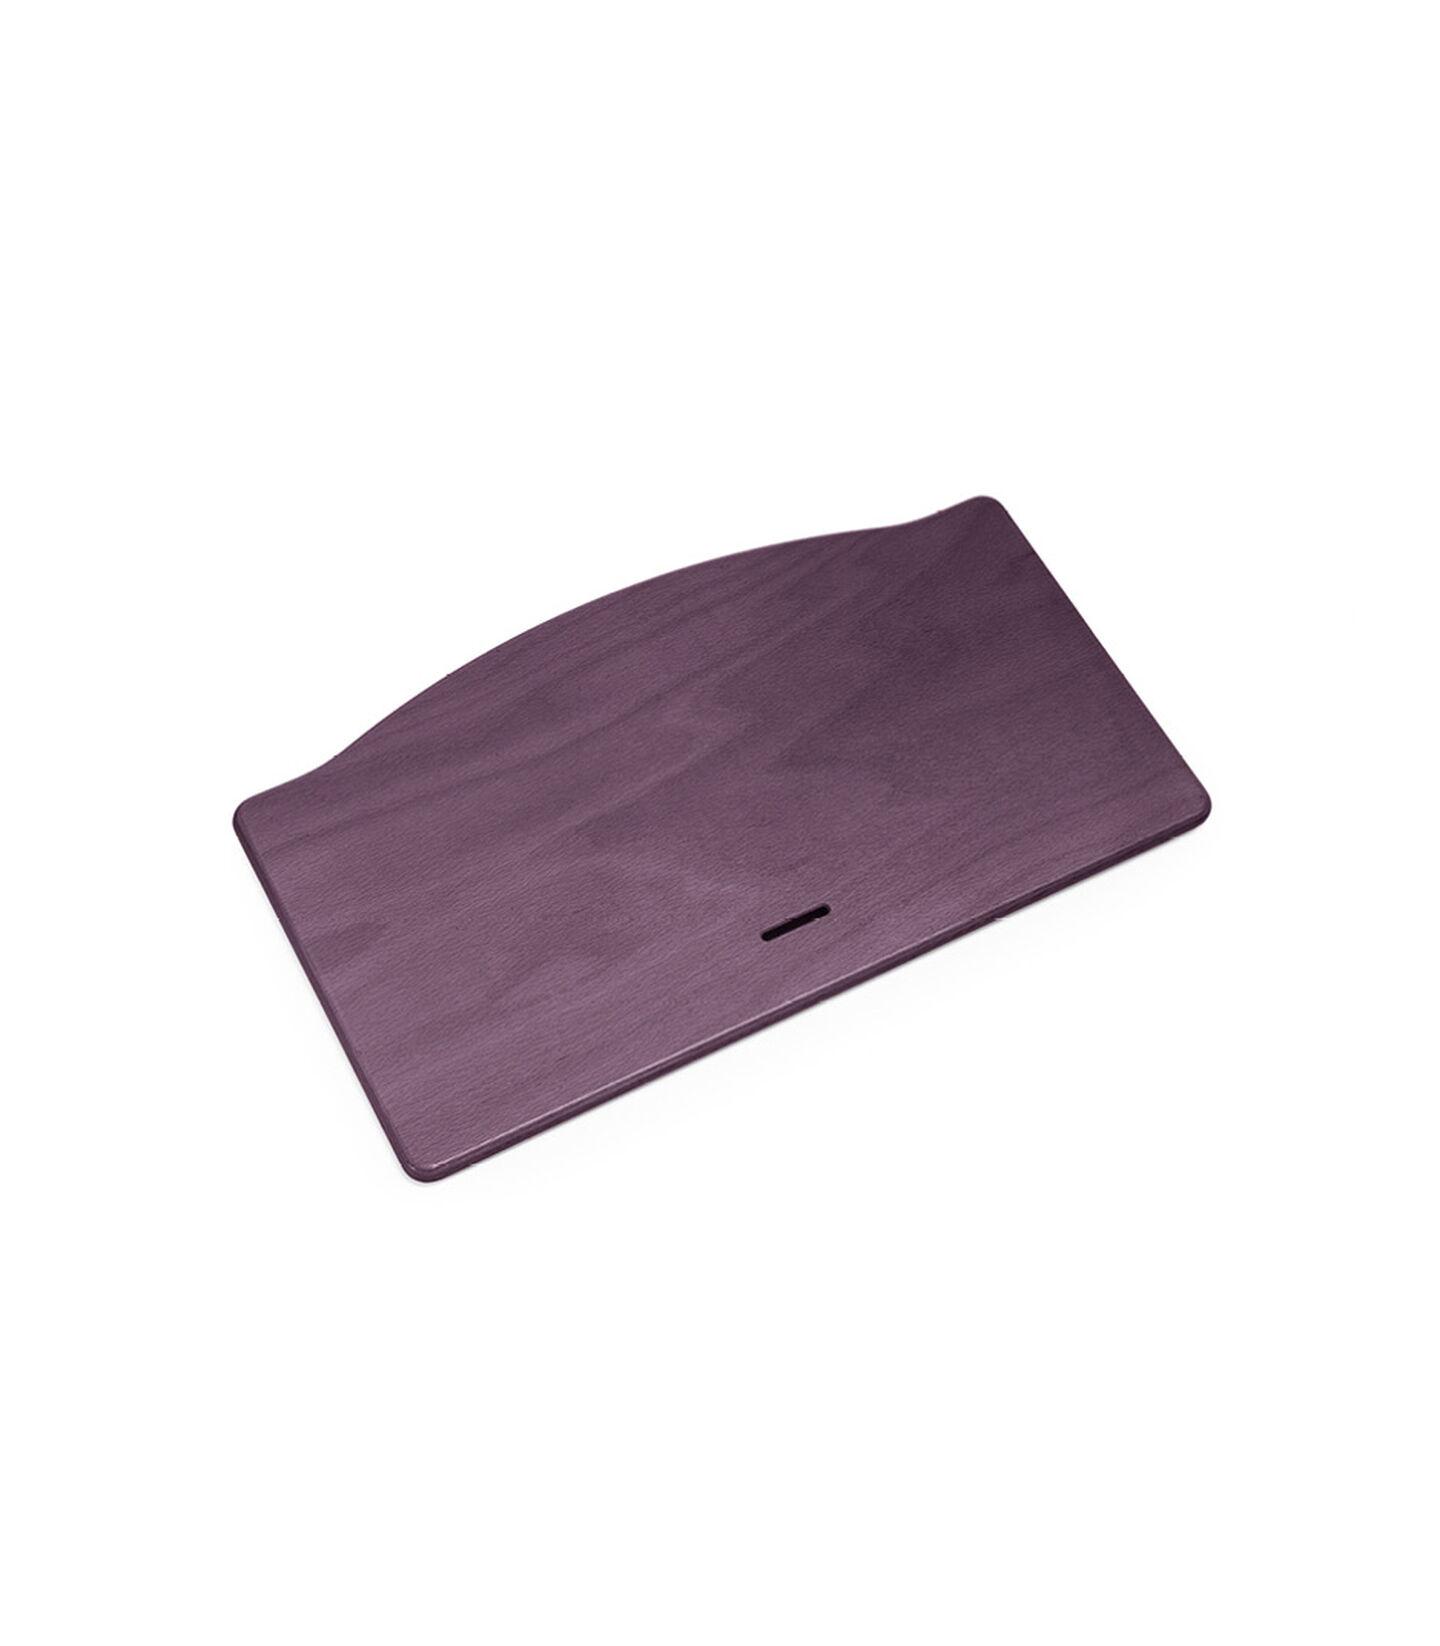 Tripp Trapp Seat plate Plum Purple (Spare part). view 1